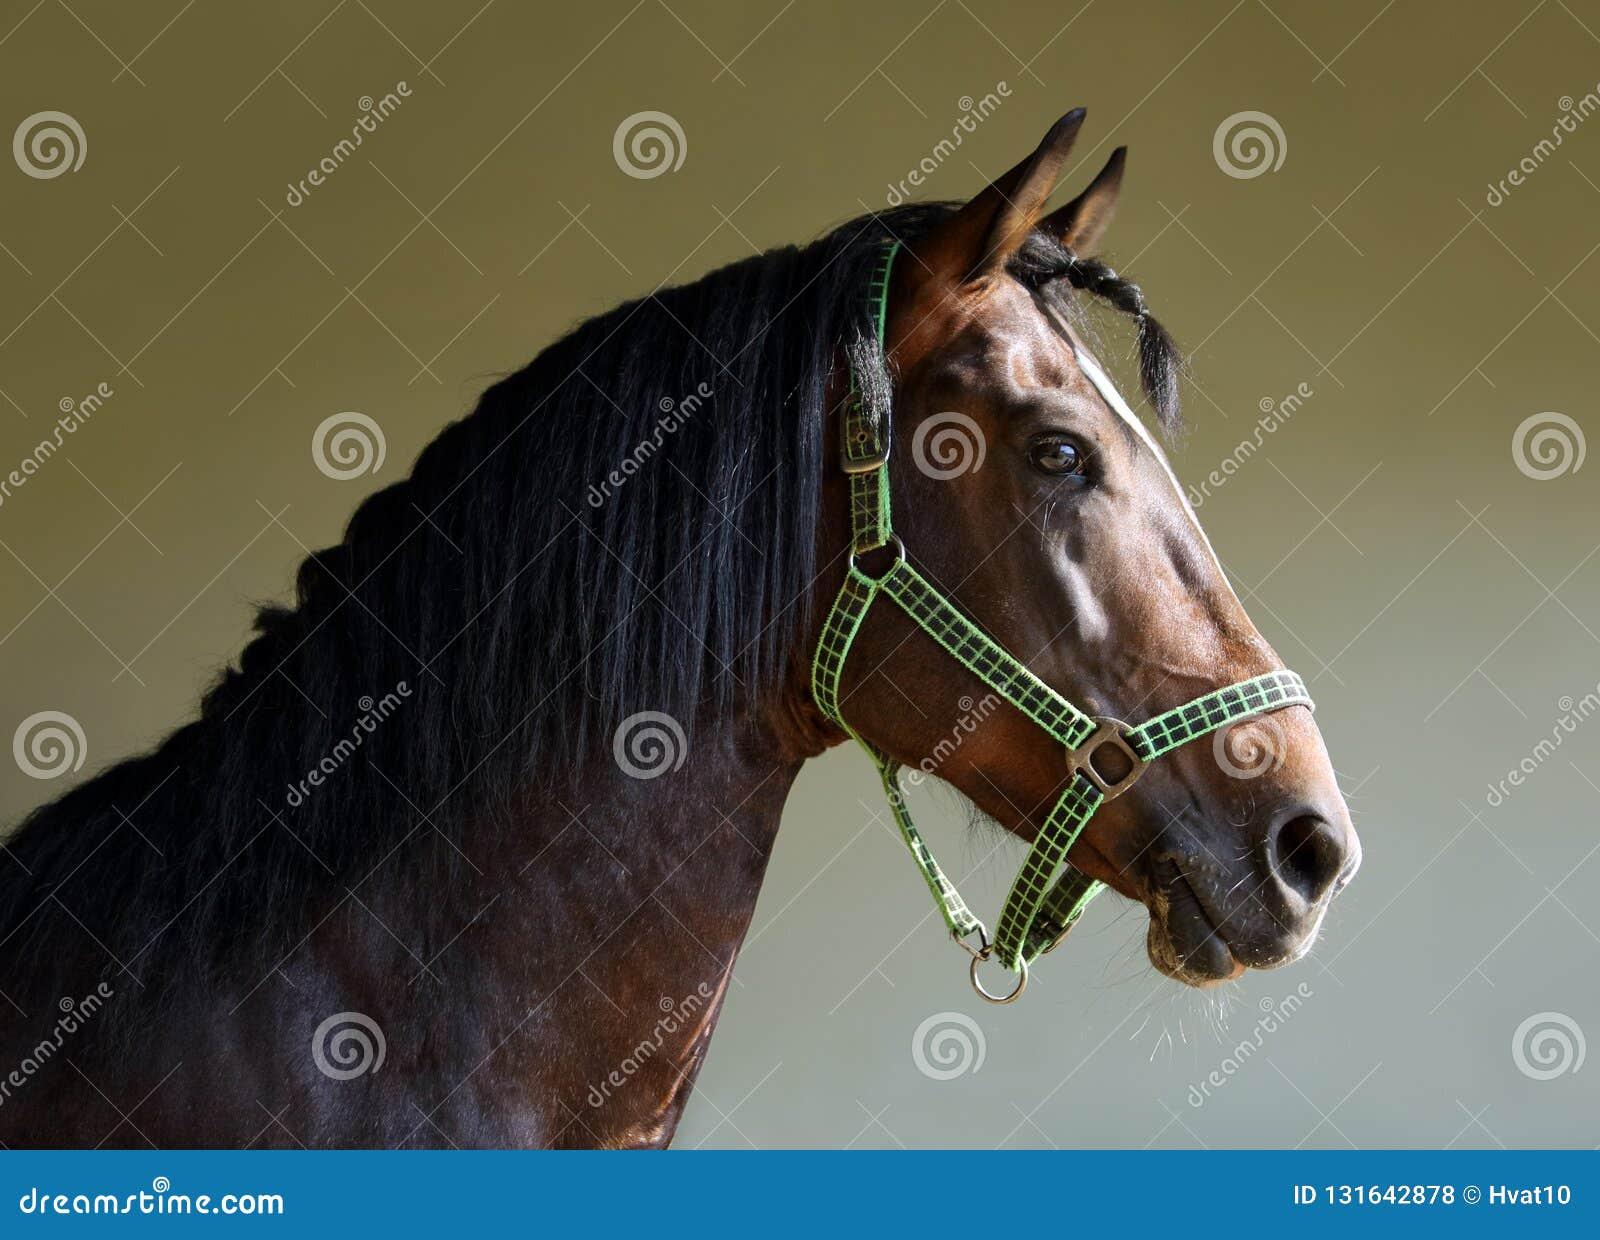 Purebred Arabian Horse Portrait Of A Bay Stallion Stock Photo Image Of Closeup Mare 131642878